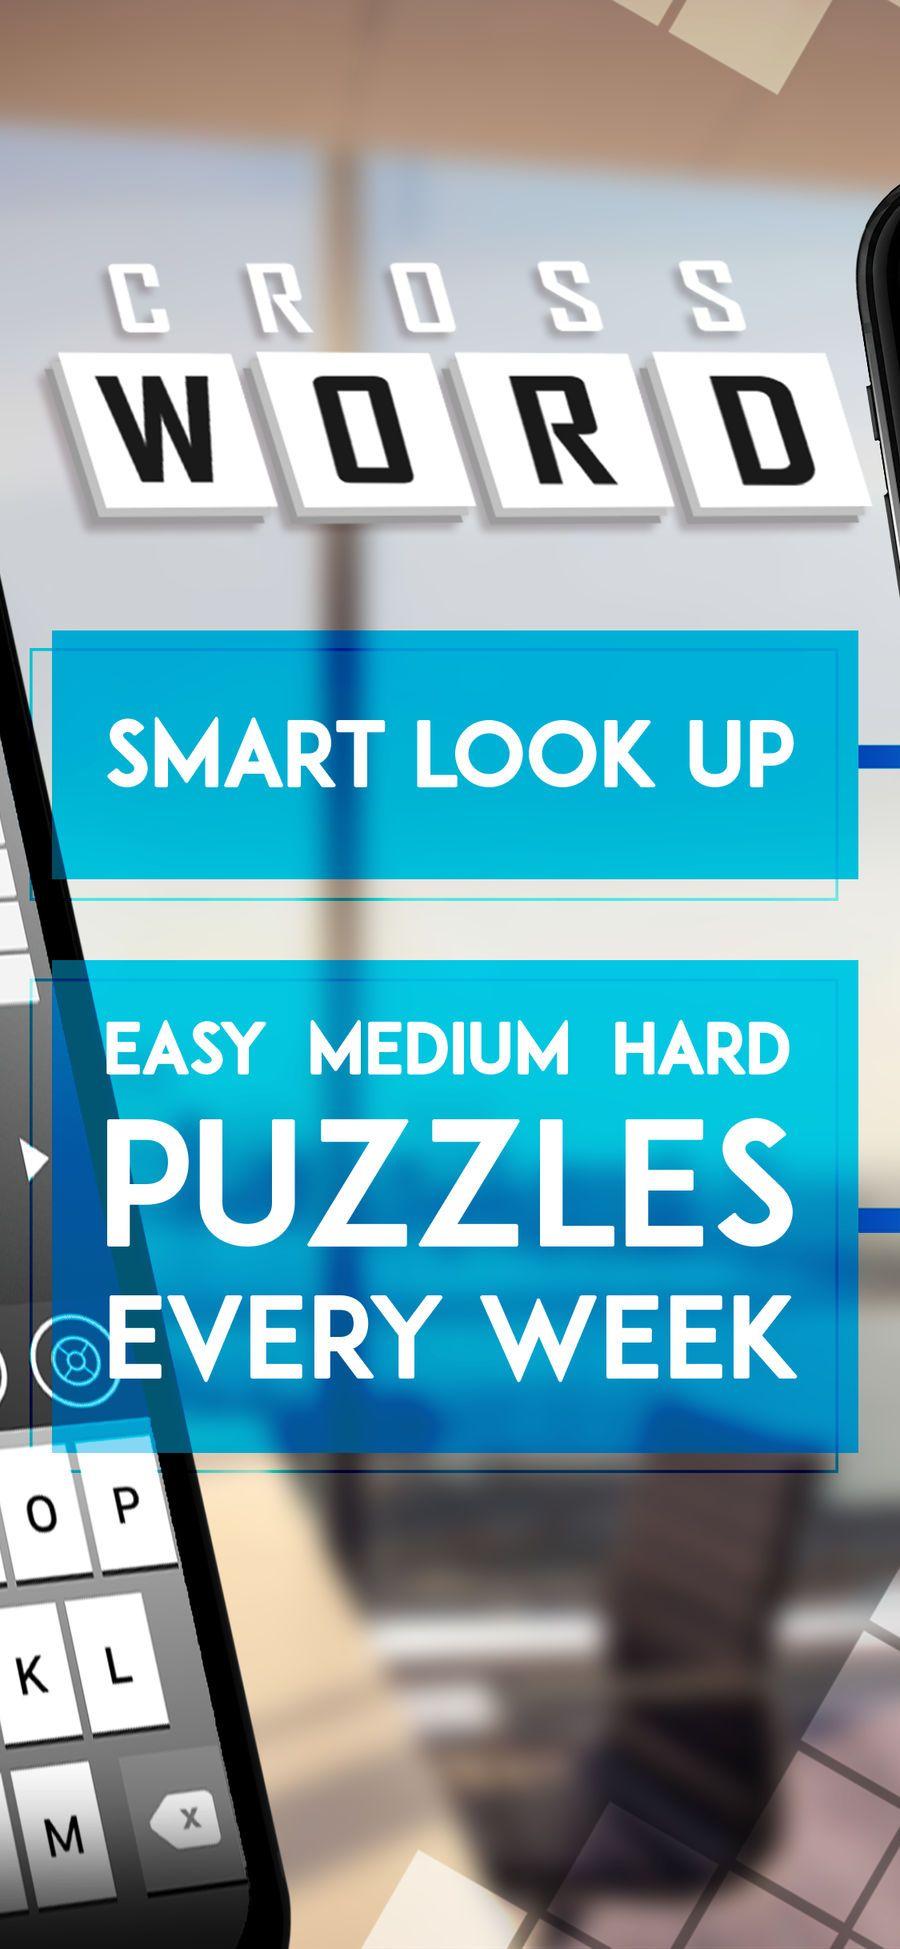 Crossword Puzzle Redstone EntertainmentWordappsios